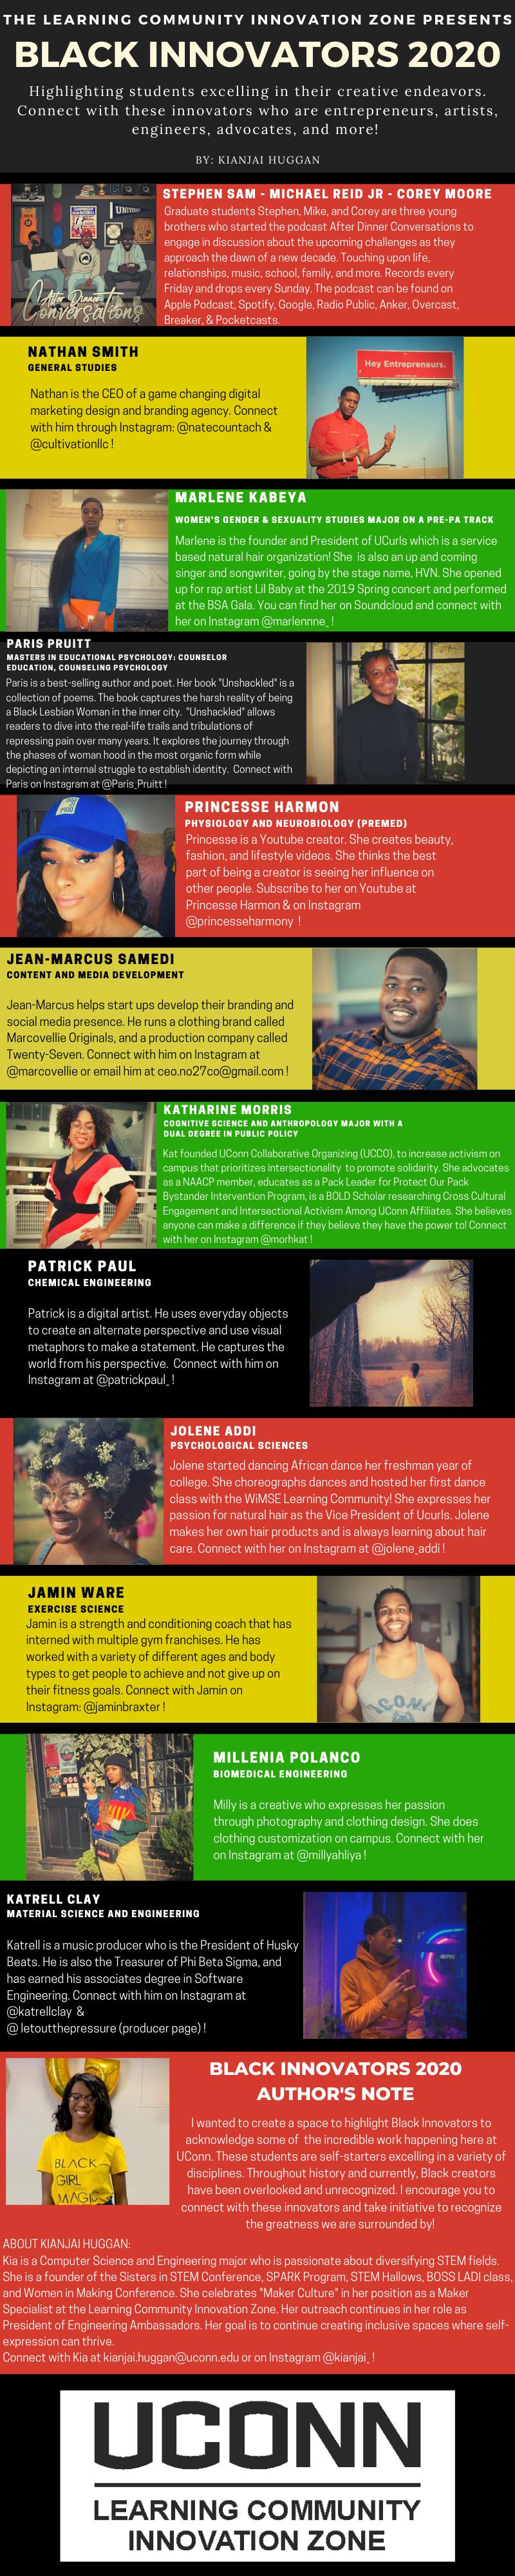 Celebrating Black Innovators 2020